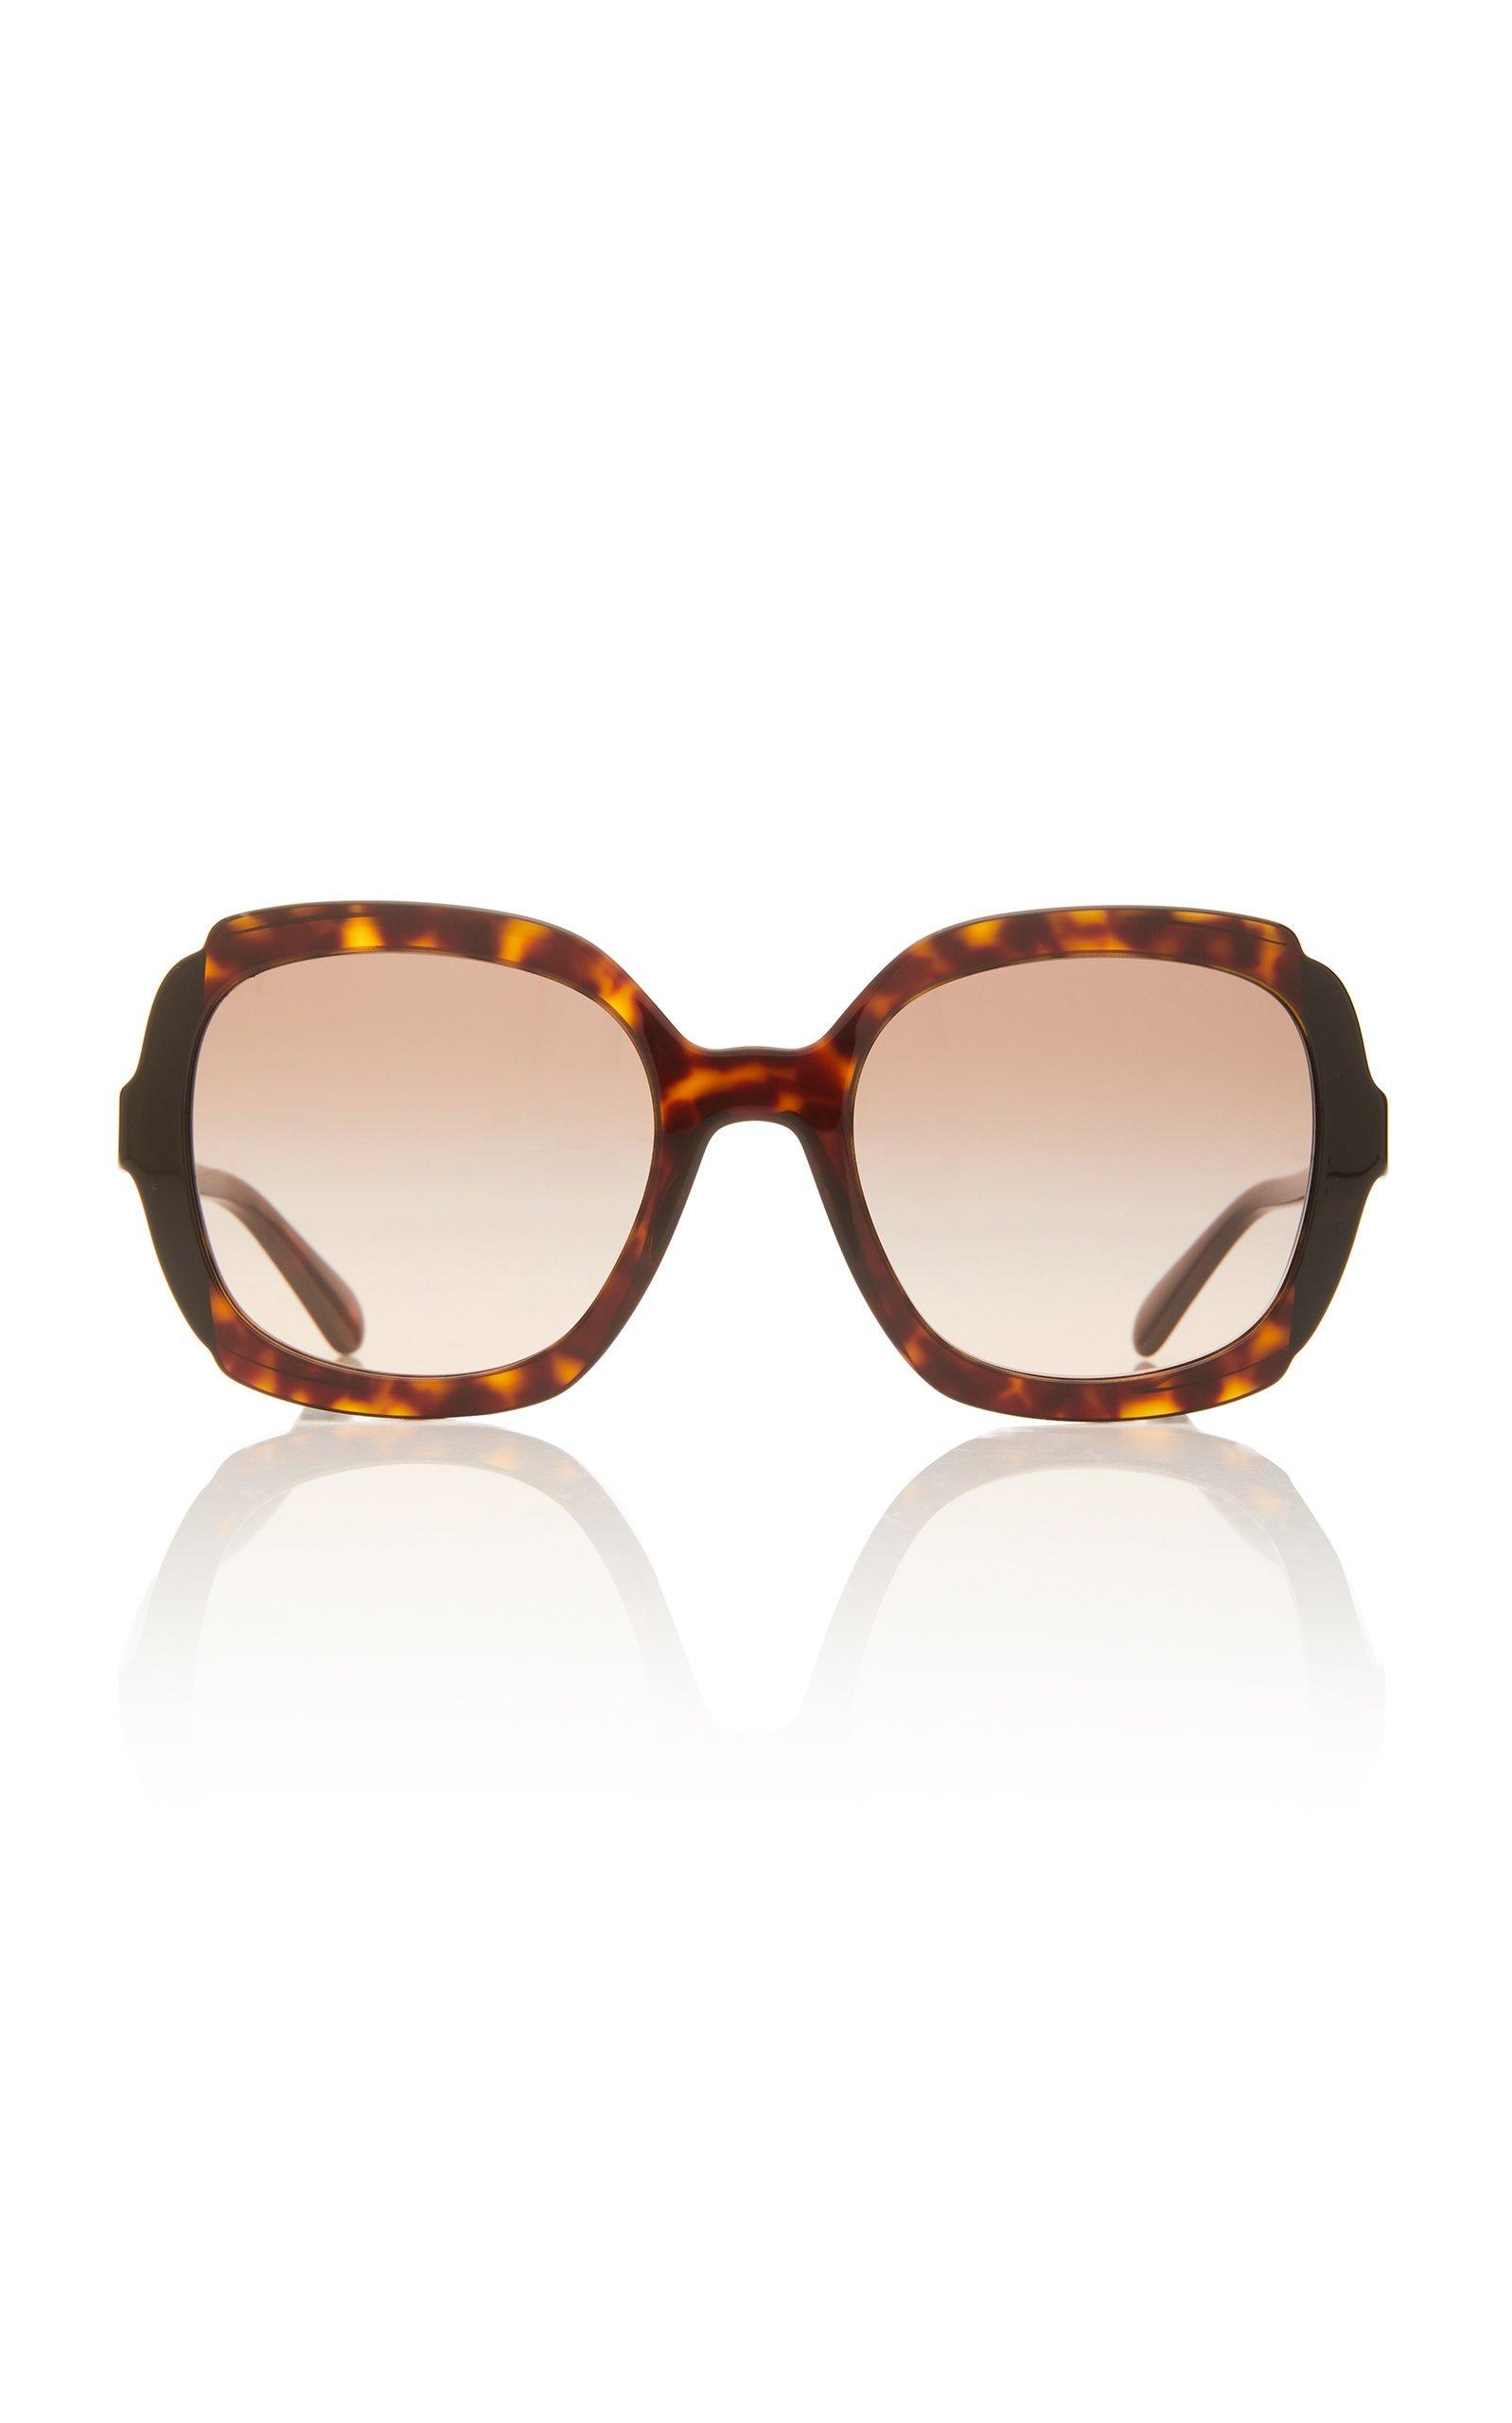 Prada Sunglasses Round-Frame Acetate Sunglasses